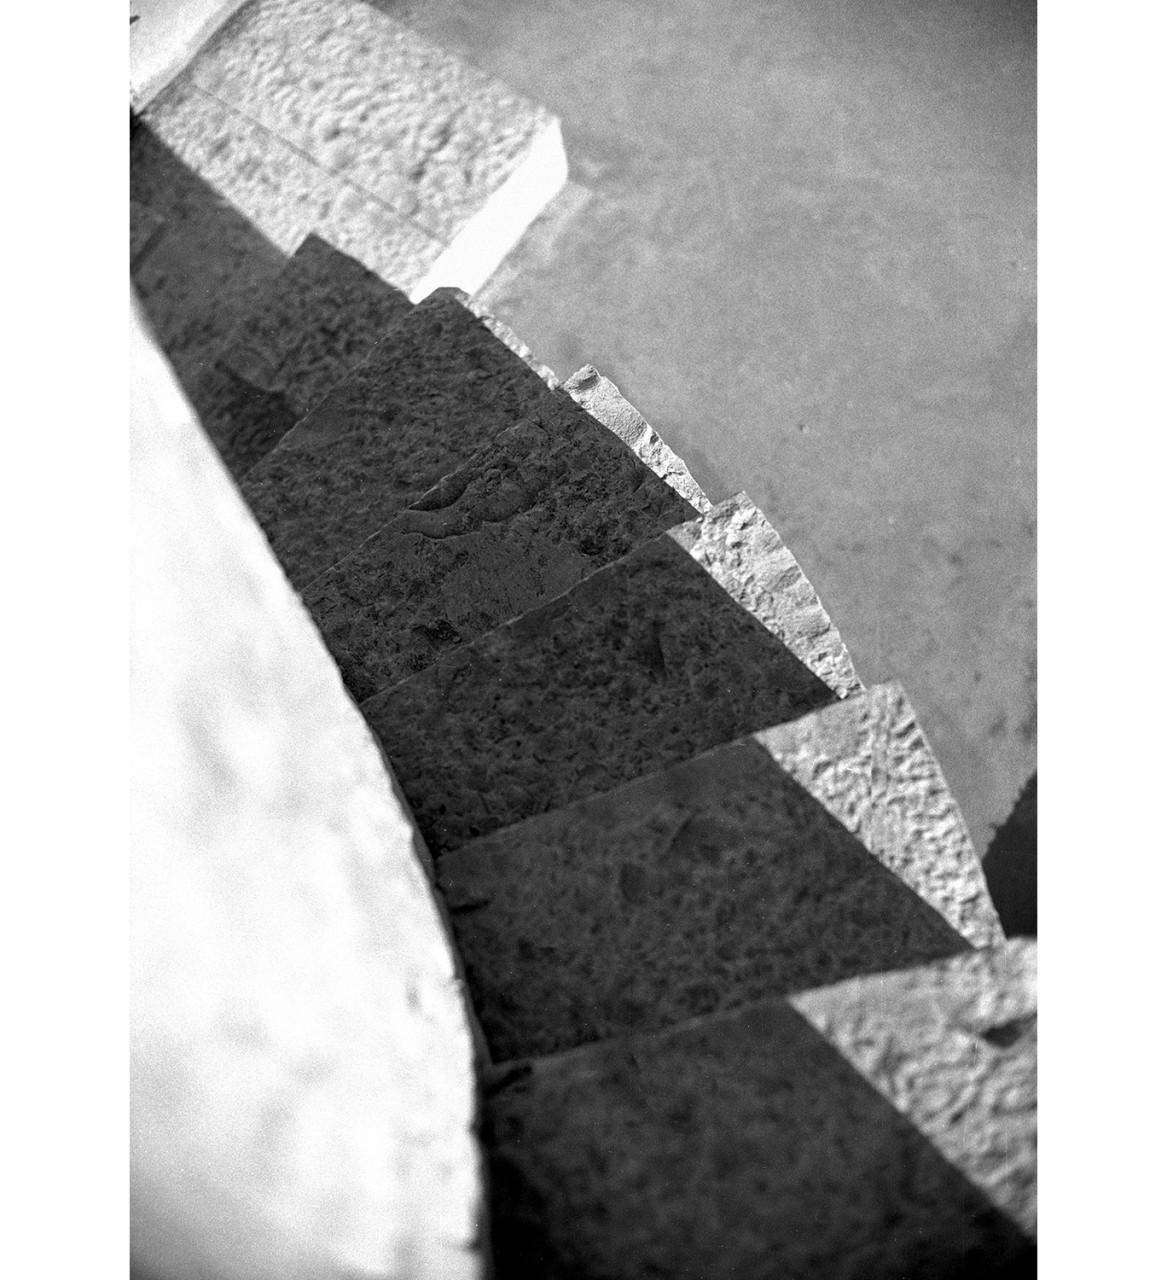 31_Sicily #49 sheet 8 frame 10a